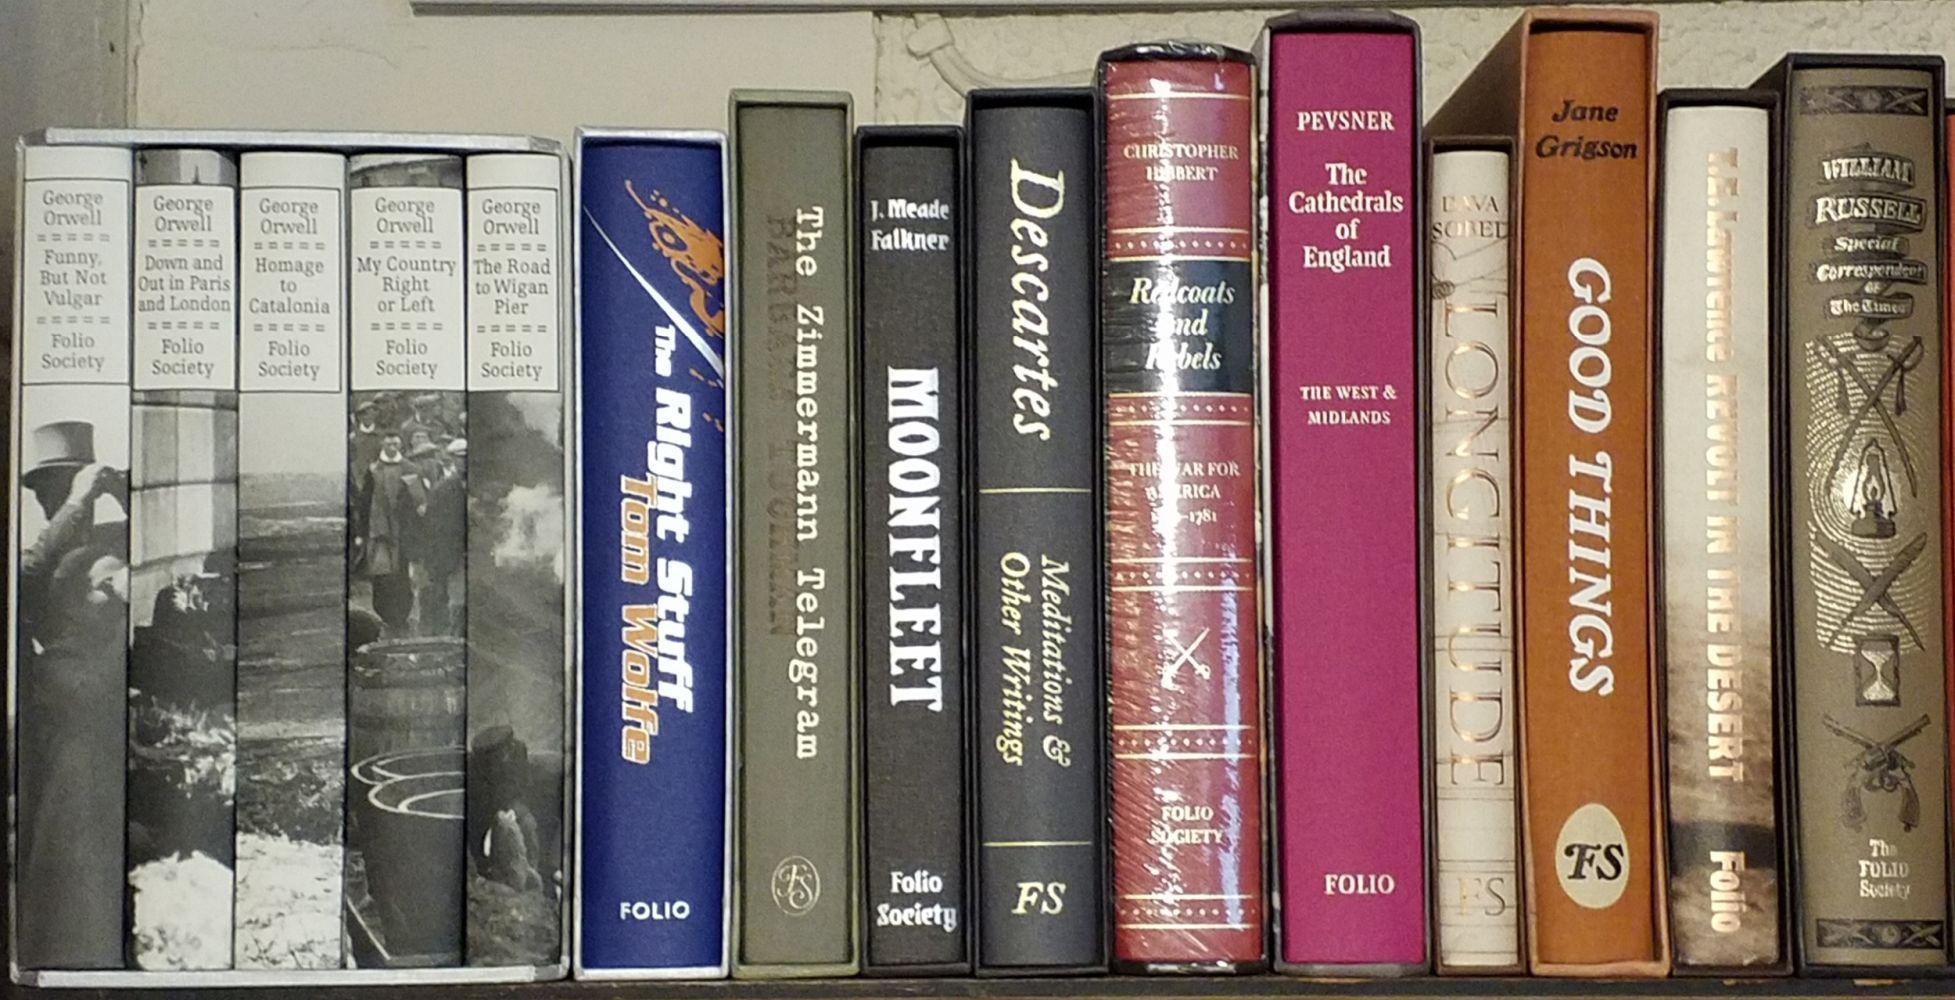 Folio Society. 78 volumes - Image 4 of 4